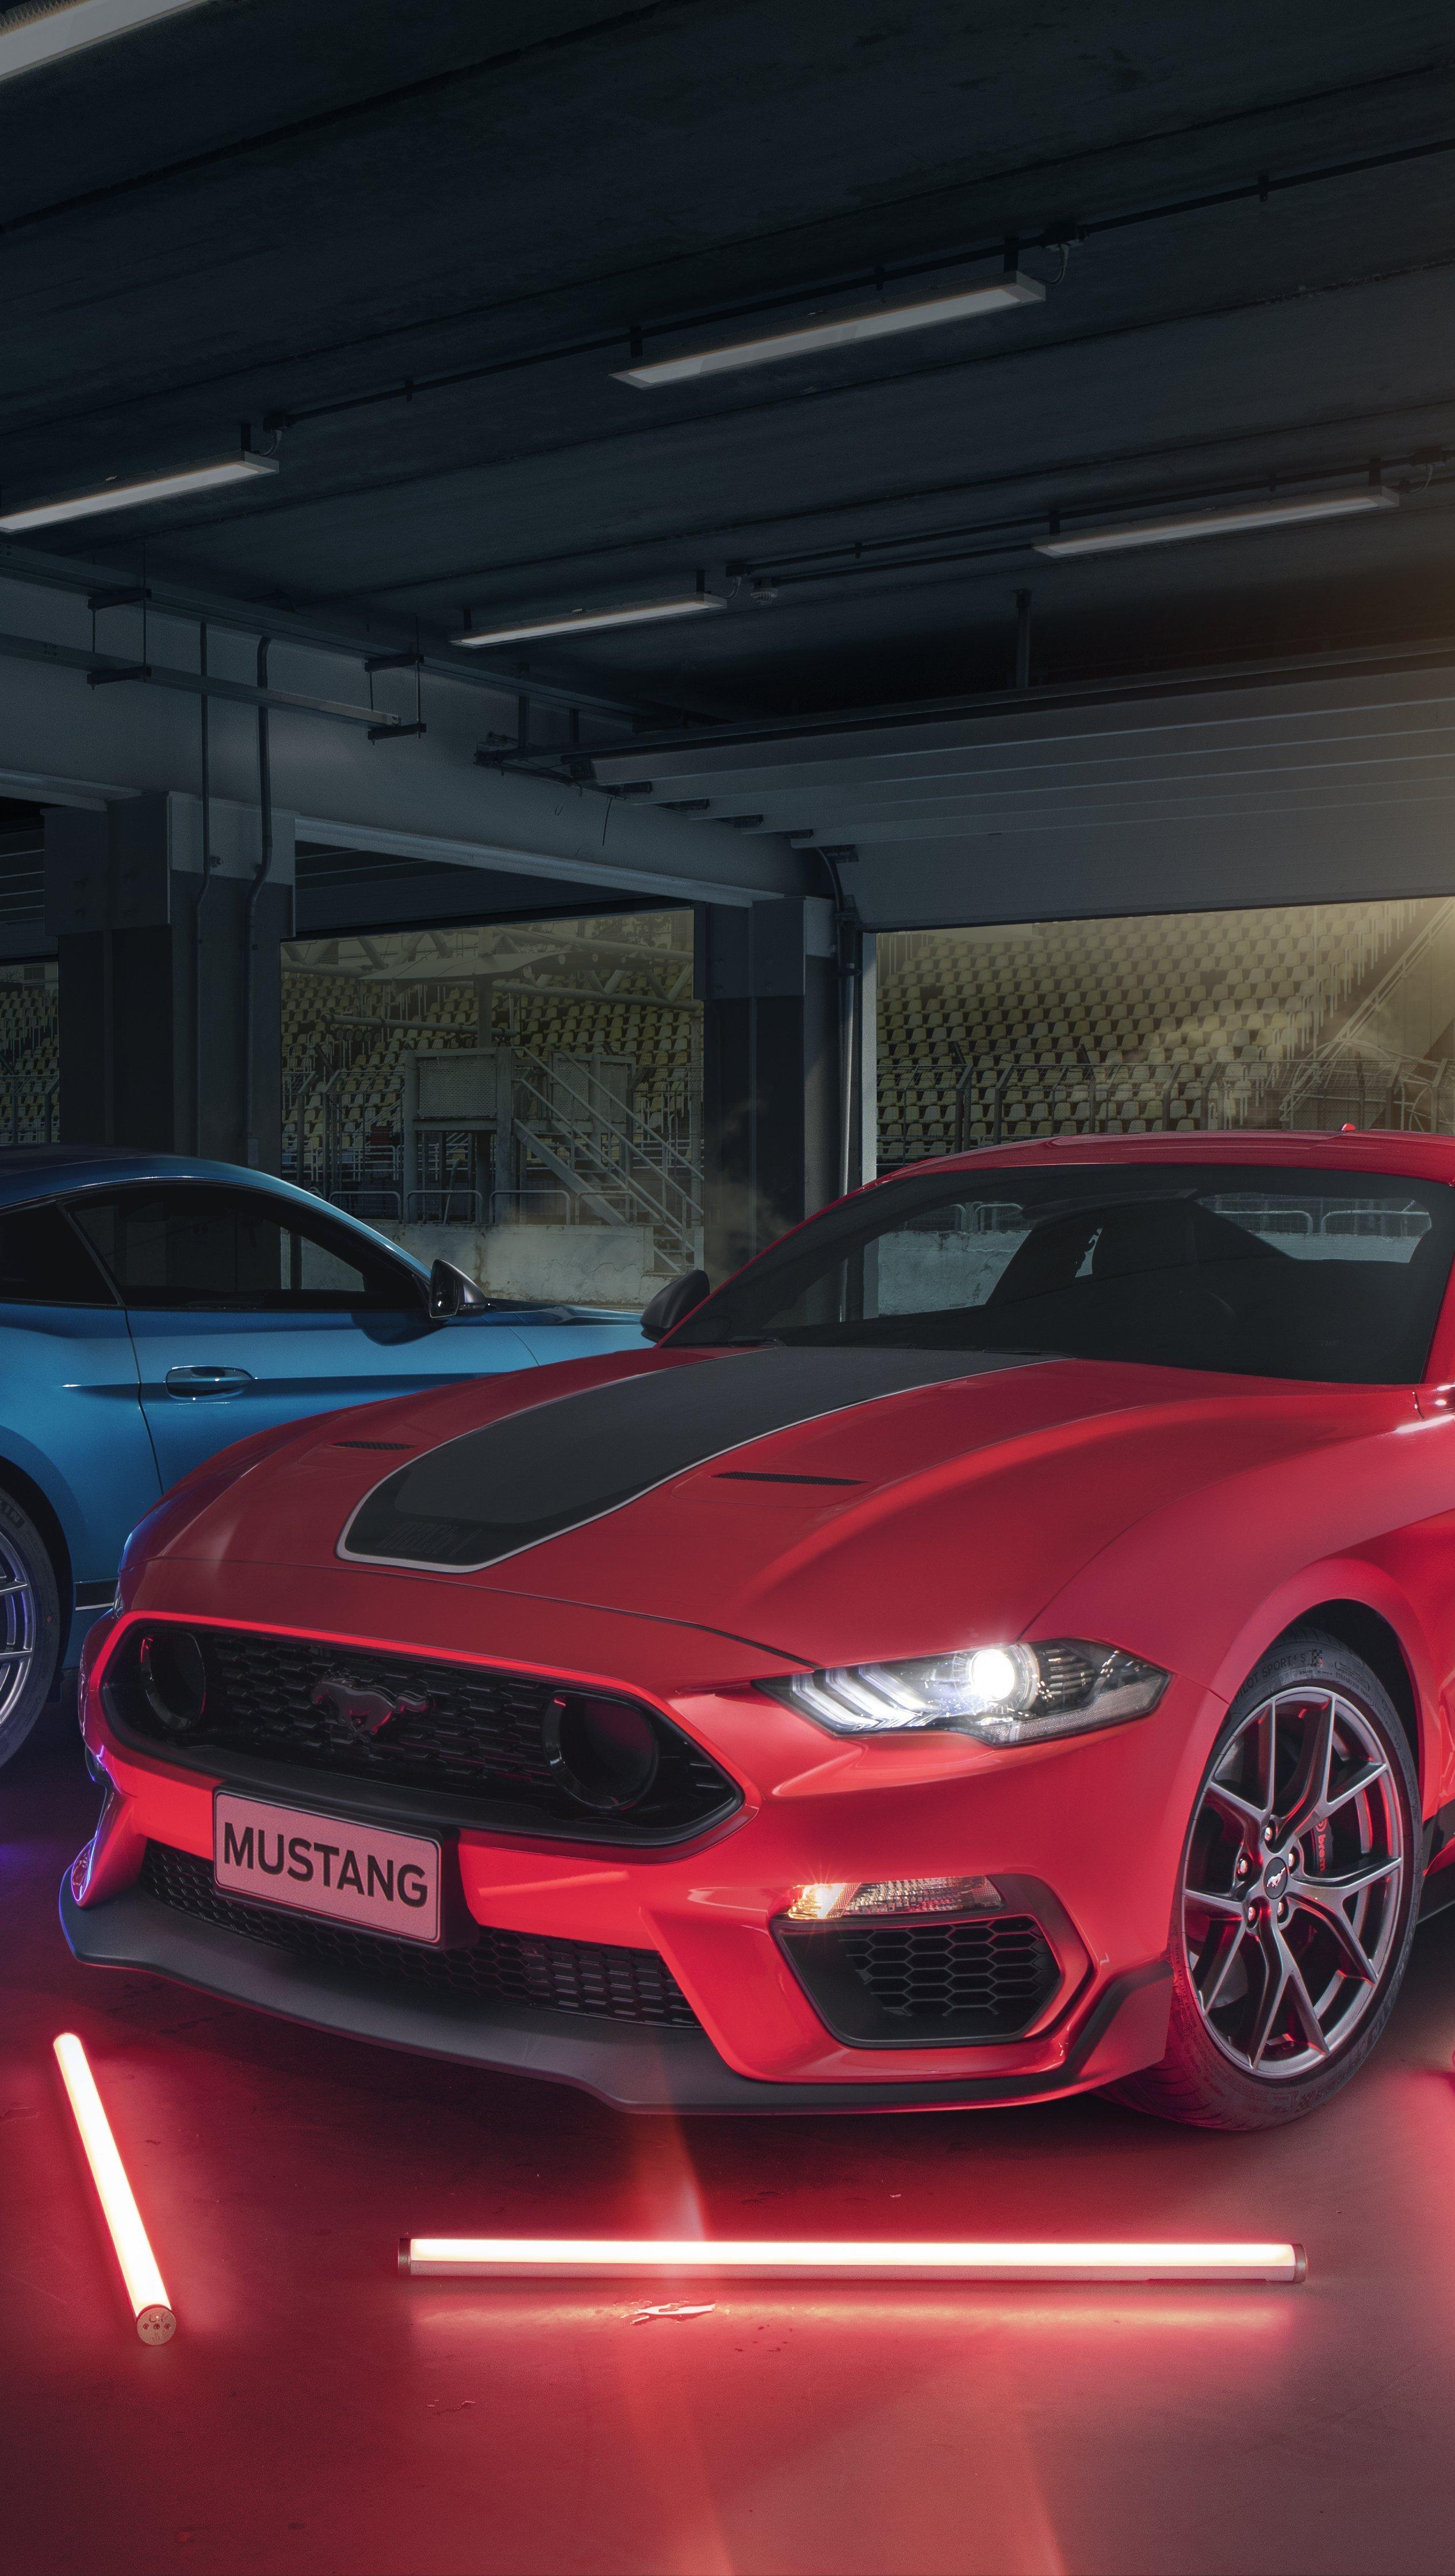 Fondos de pantalla Ford Mustang Mach 1 Vertical